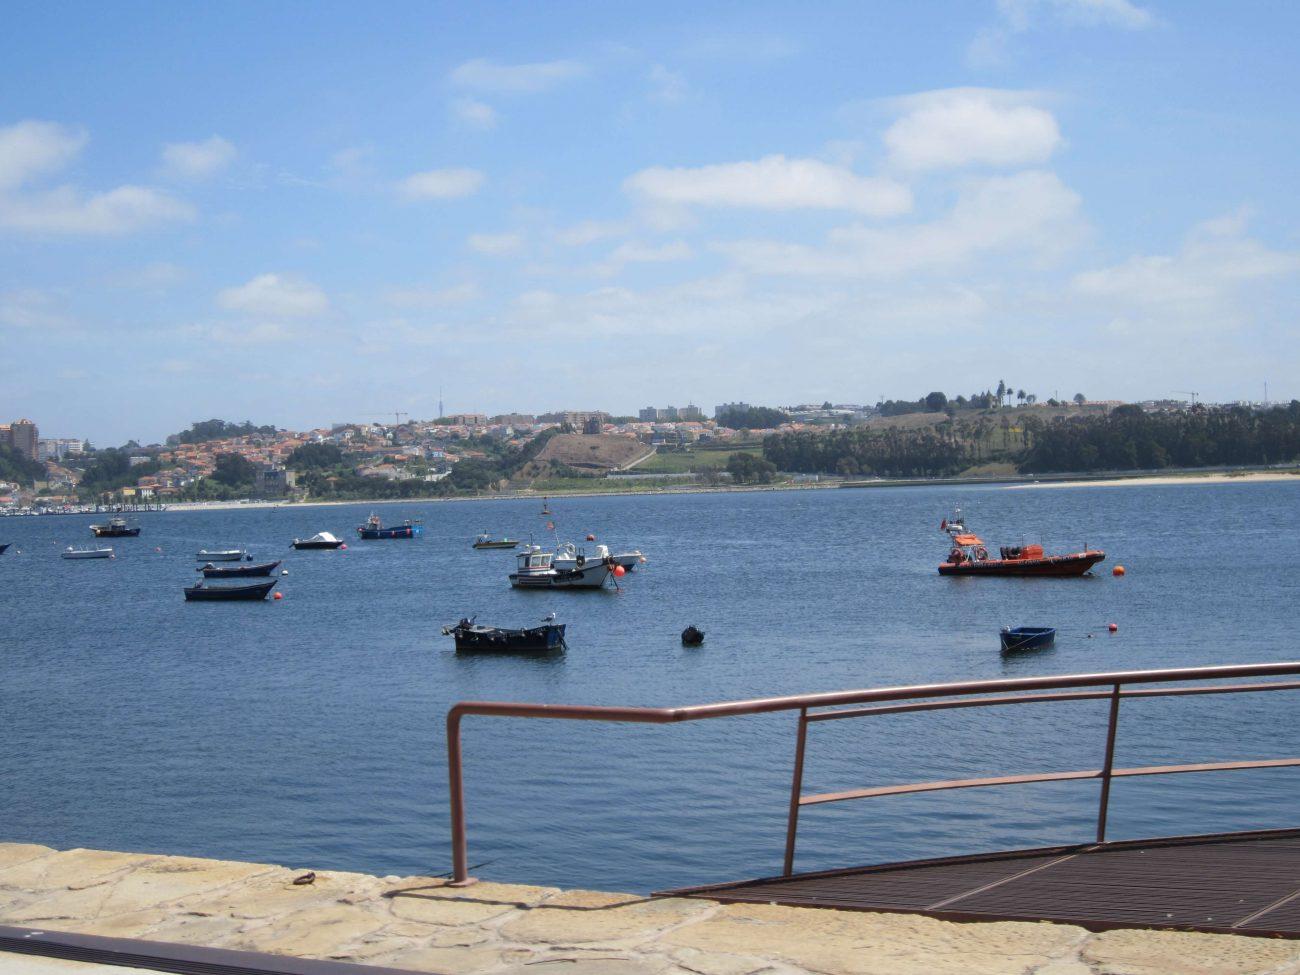 Portugal Douro Fluss Fischerboote Atlantik